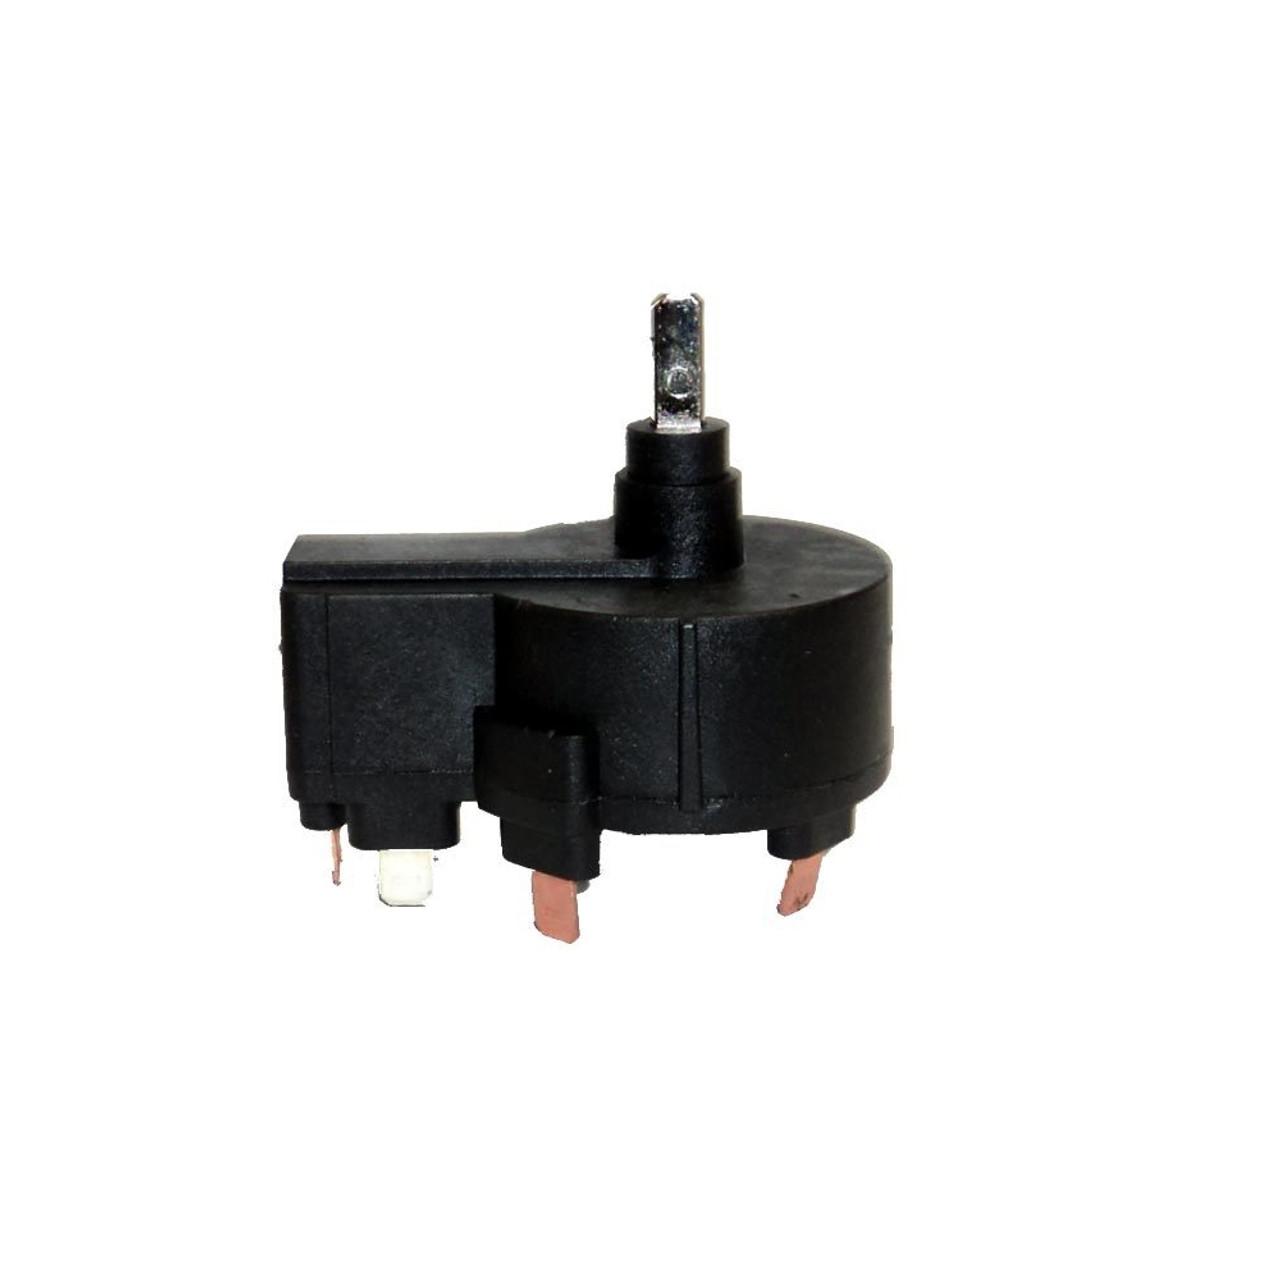 MINN KOTA 2064028 5 spd Forward /& 3 Spd Reverse Switch OEM UK Stock